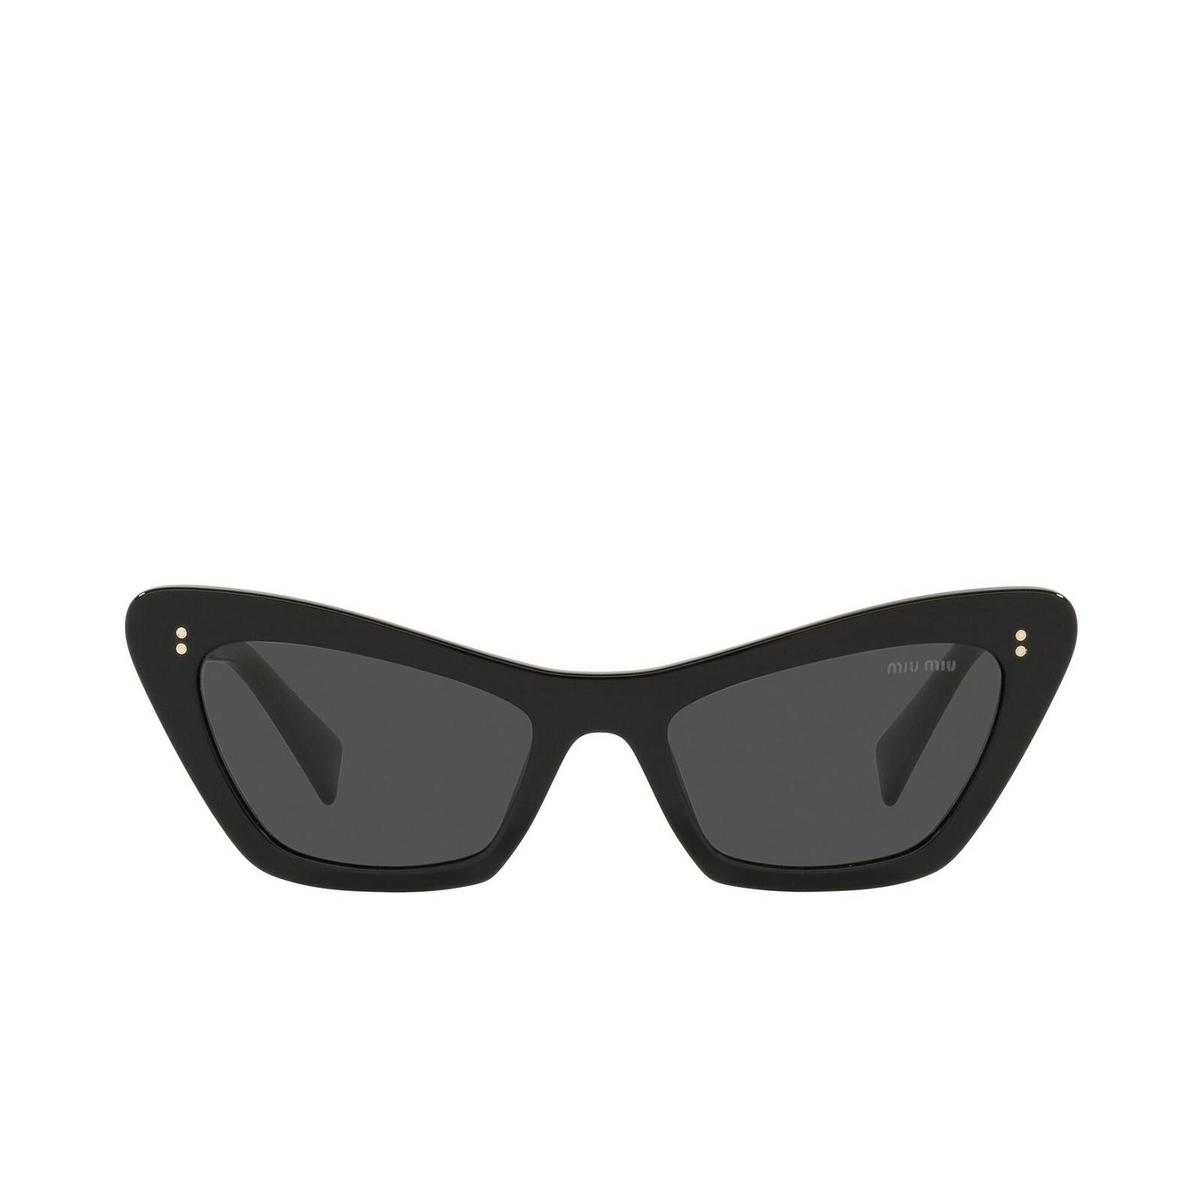 Miu Miu® Cat-eye Sunglasses: MU 03XS color Black 1AB5S0.